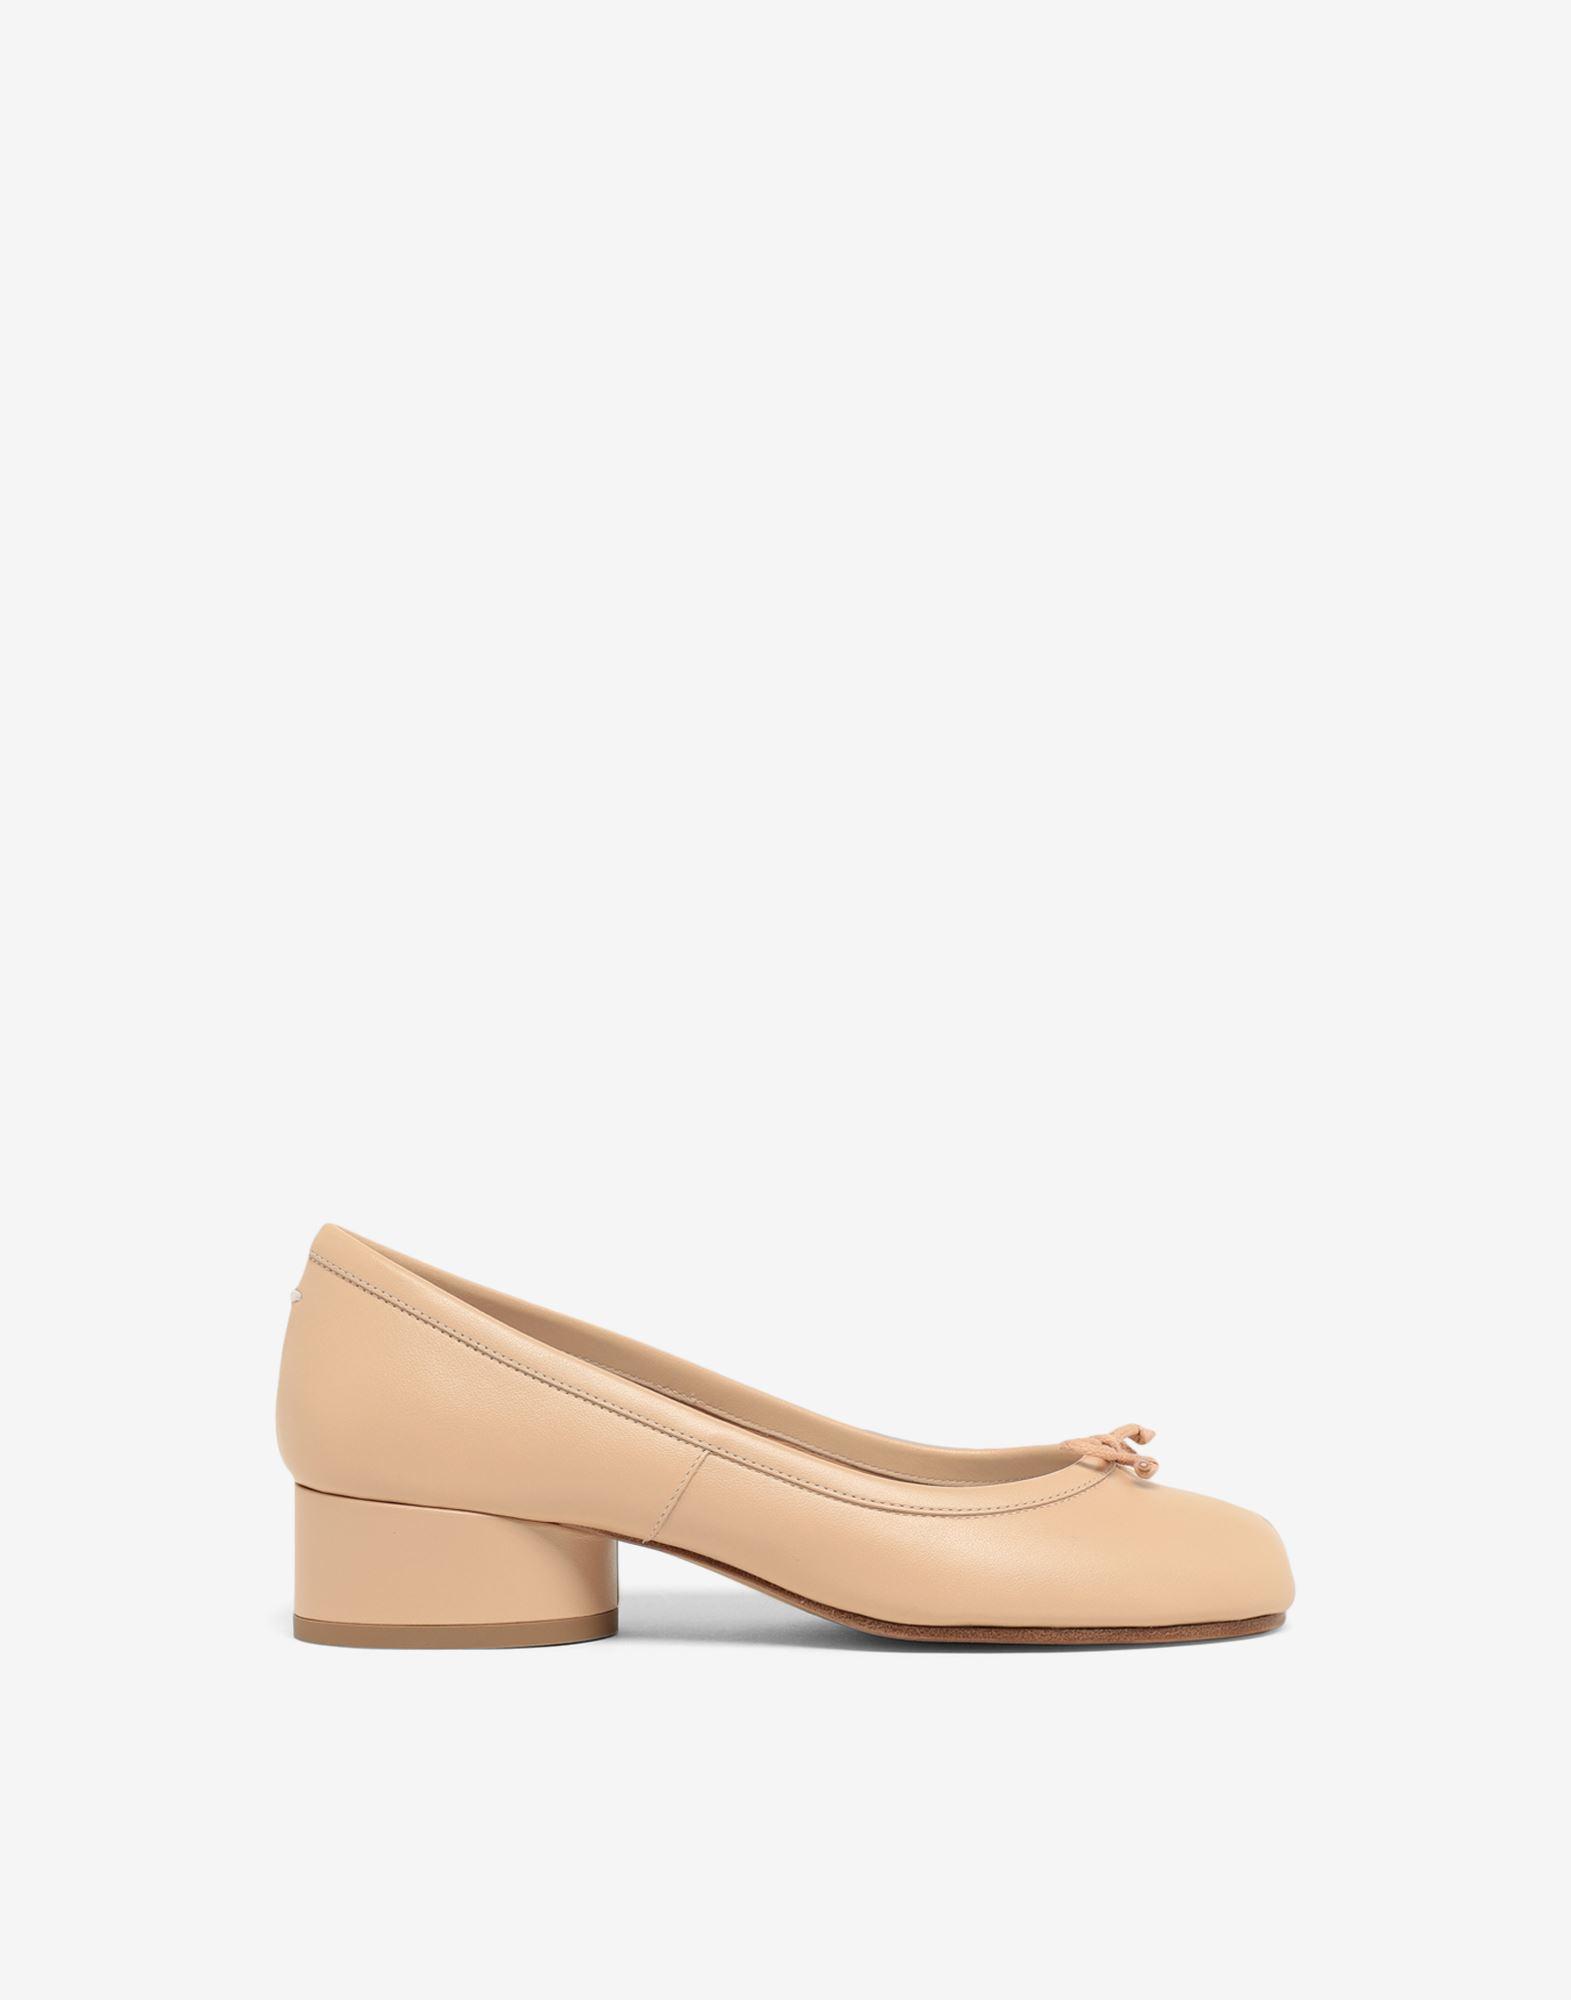 MAISON MARGIELA Кожаные балетки Tabi на каблуках Балетки Для Женщин f